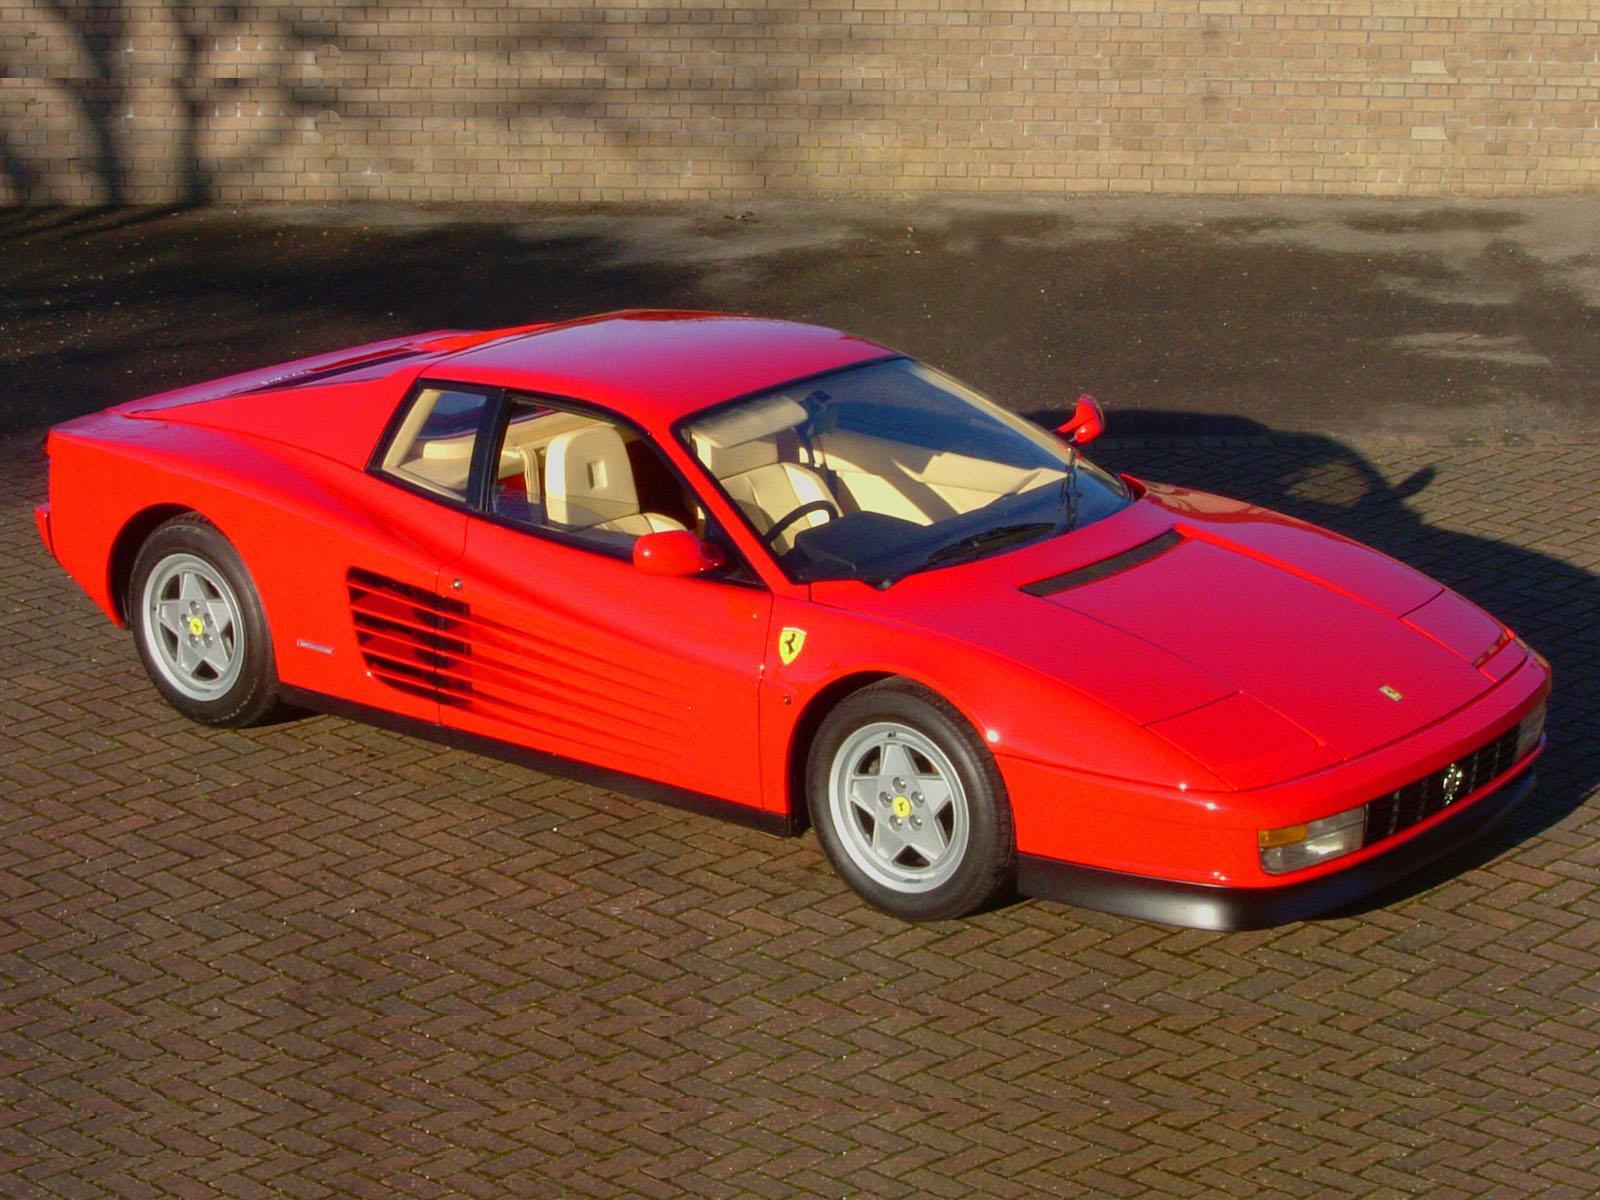 Cl 225 Sicos Ferrari Testarossa Autocosmos Com